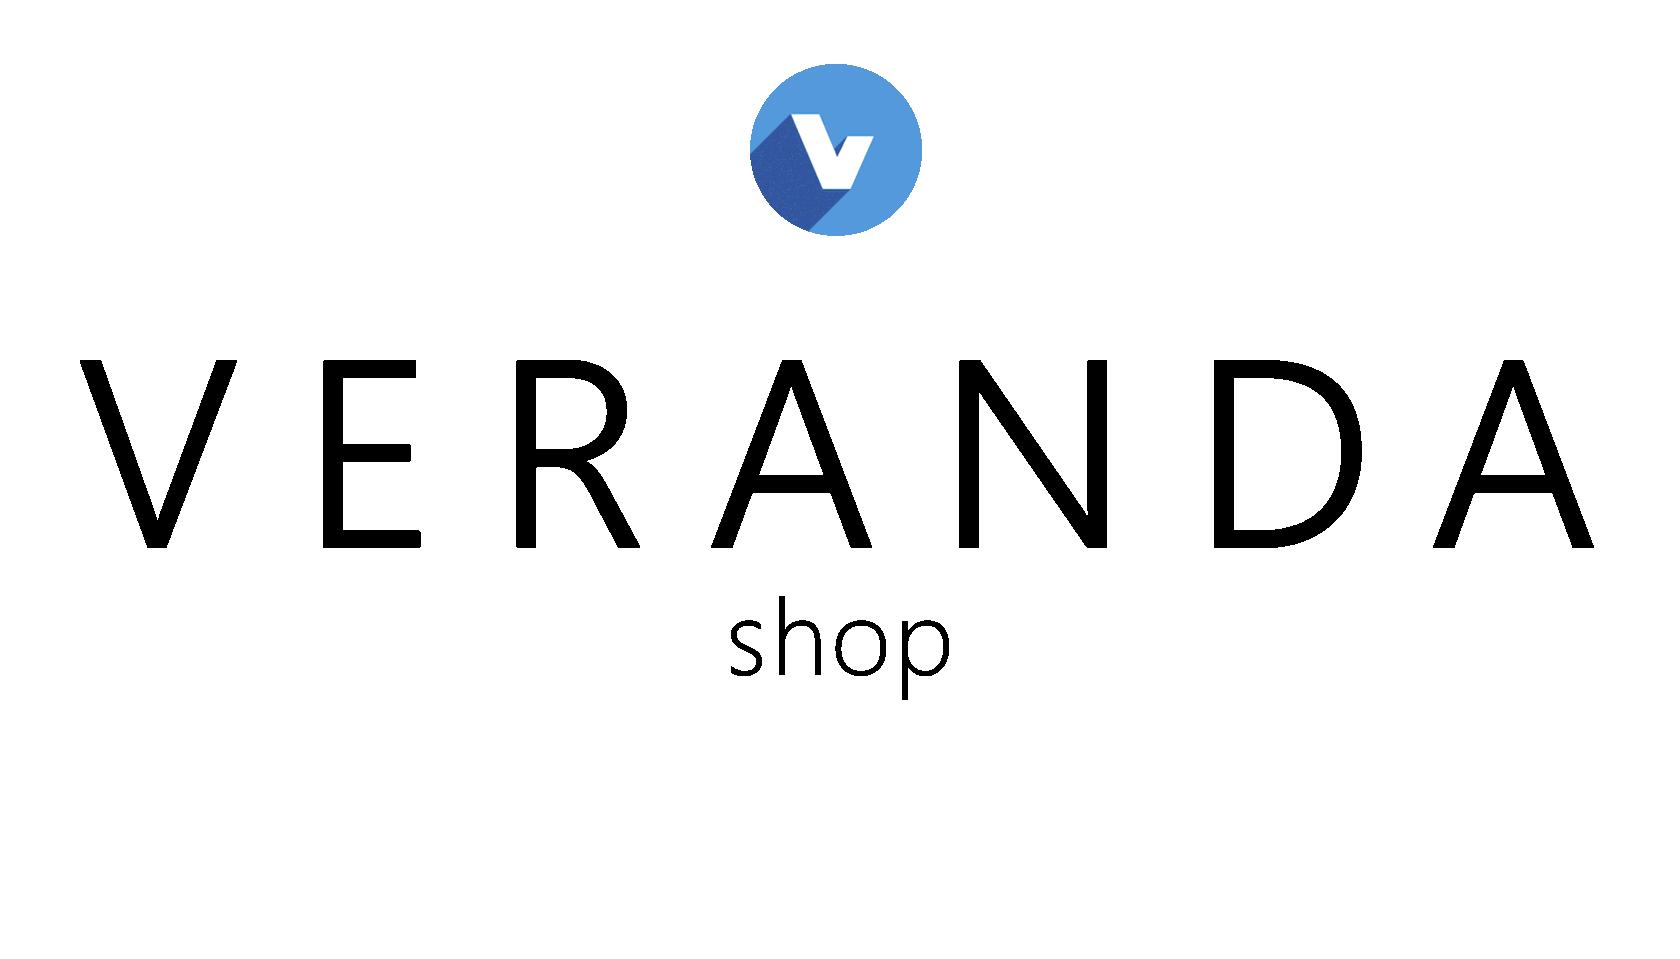 VERANDA shop